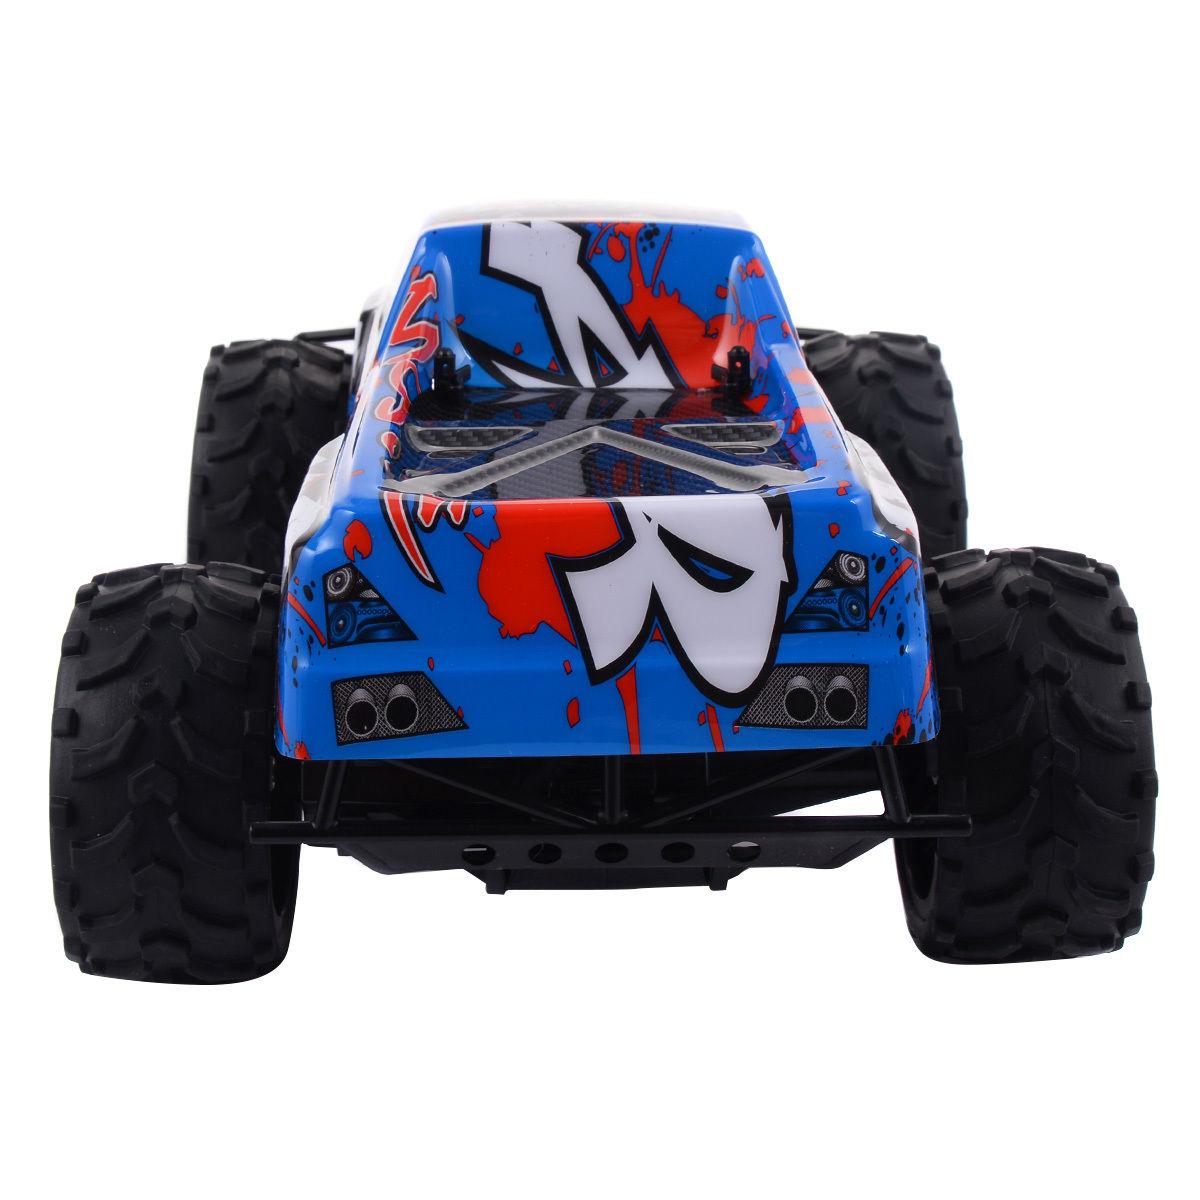 Blue 1:12 2.4G RC Car Super High Speed Remote Control Sport Racing Car